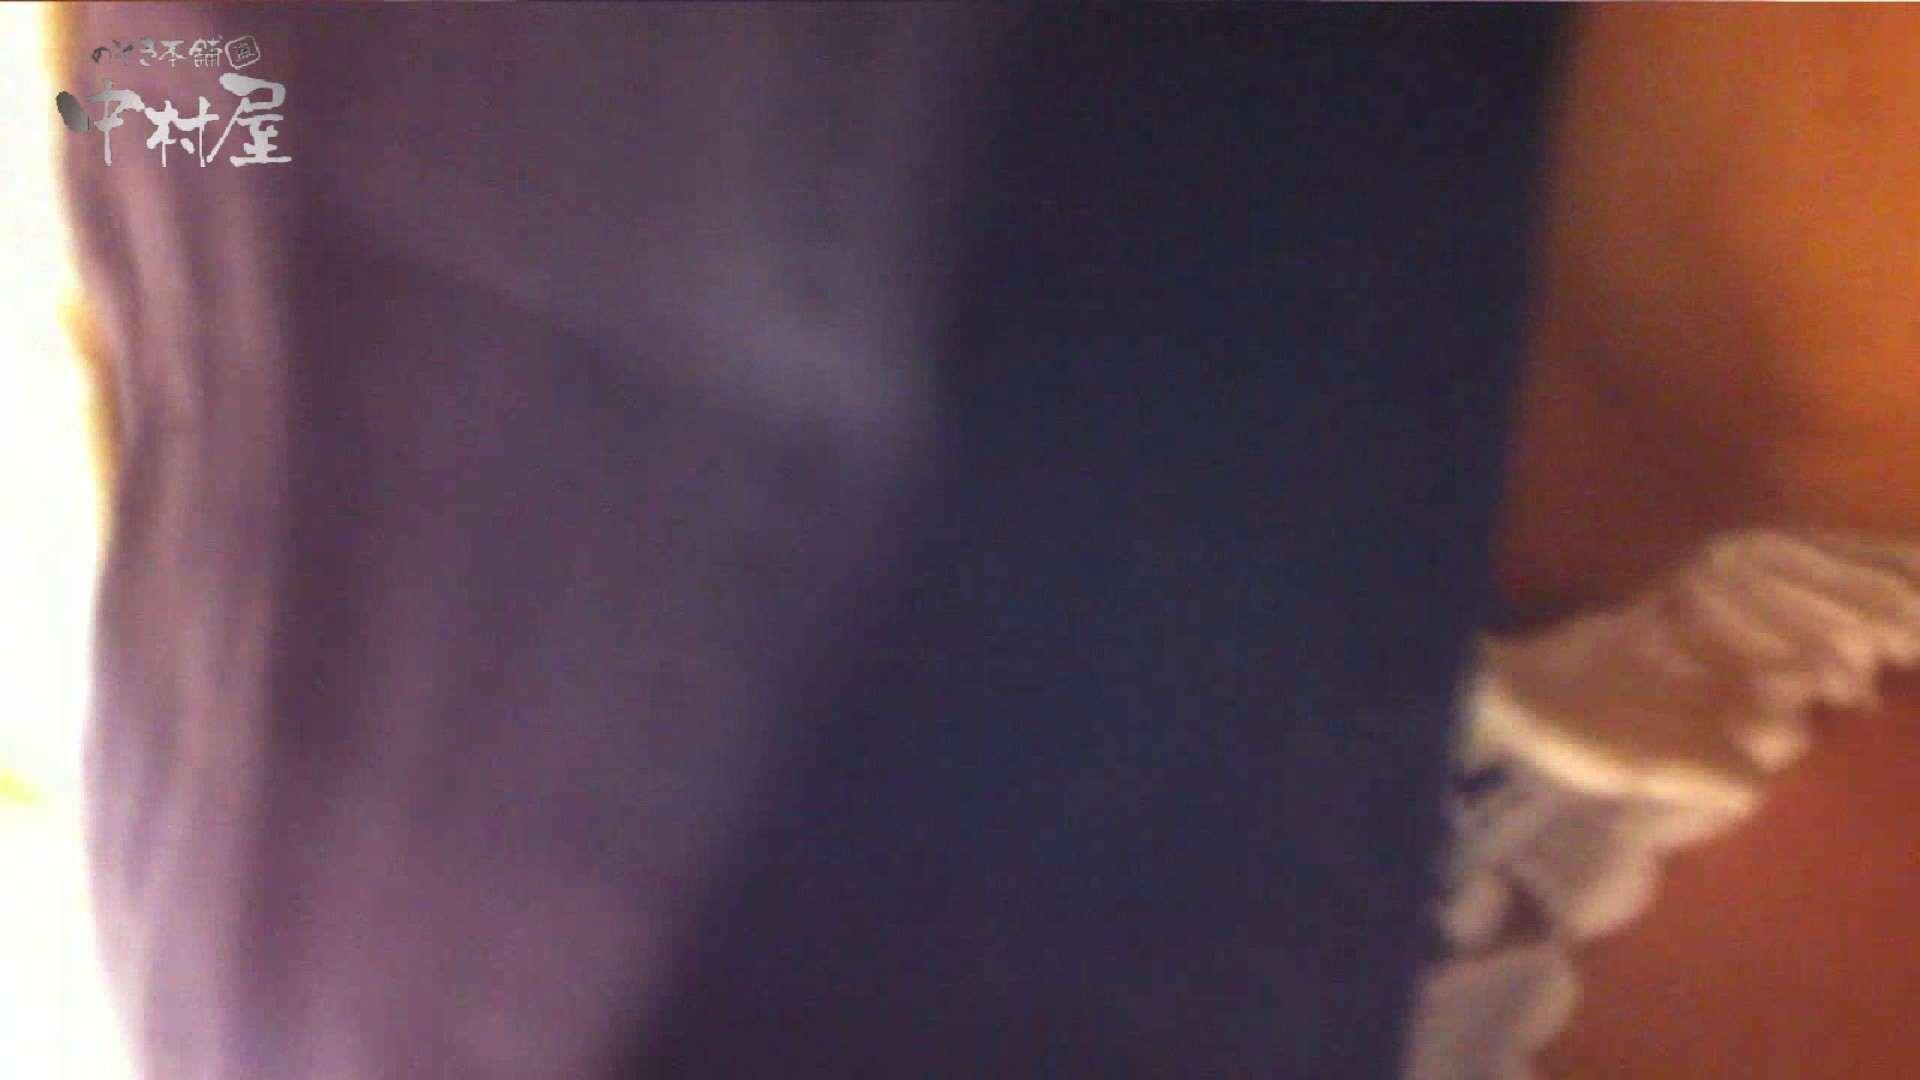 vol.71 美人アパレル胸チラ&パンチラ クイコミパンツでお買い物 チラ 盗み撮り動画 65連発 12